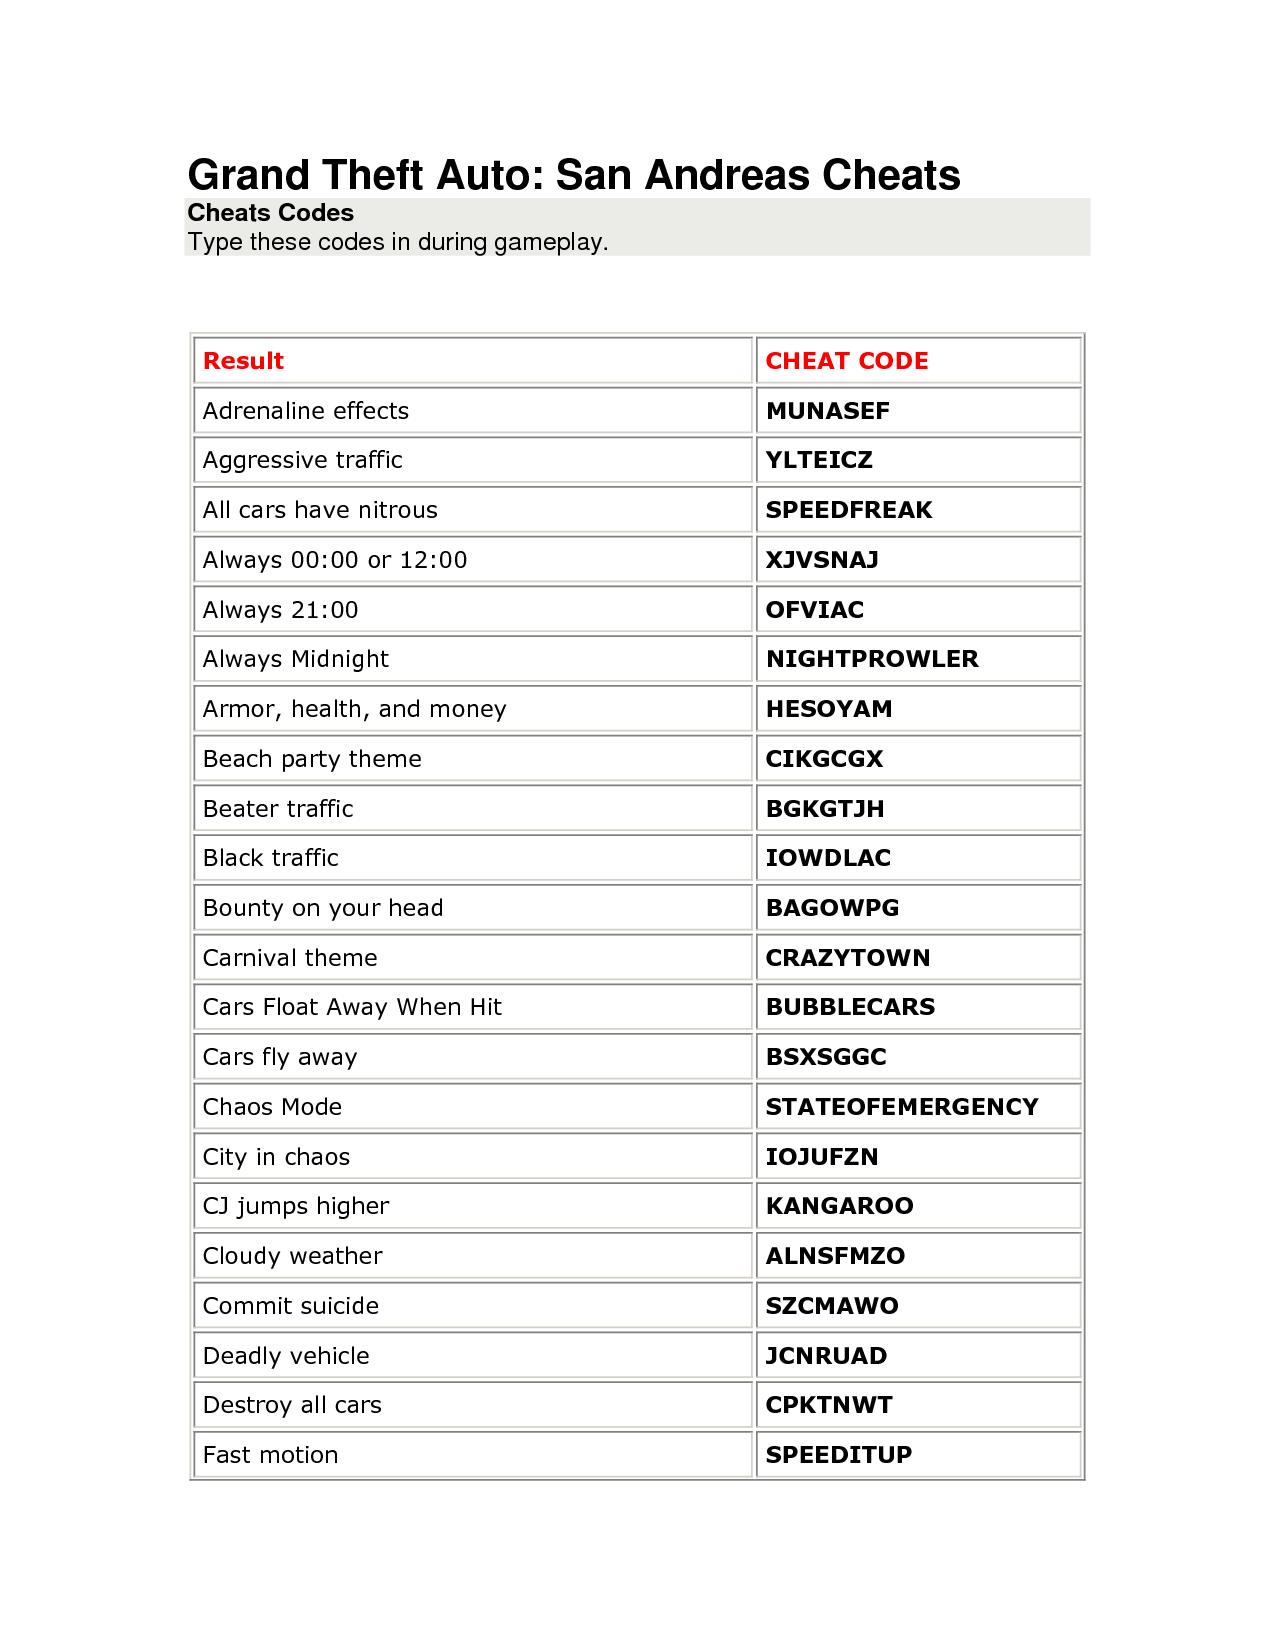 gta san andreas cheats pc pdf download free